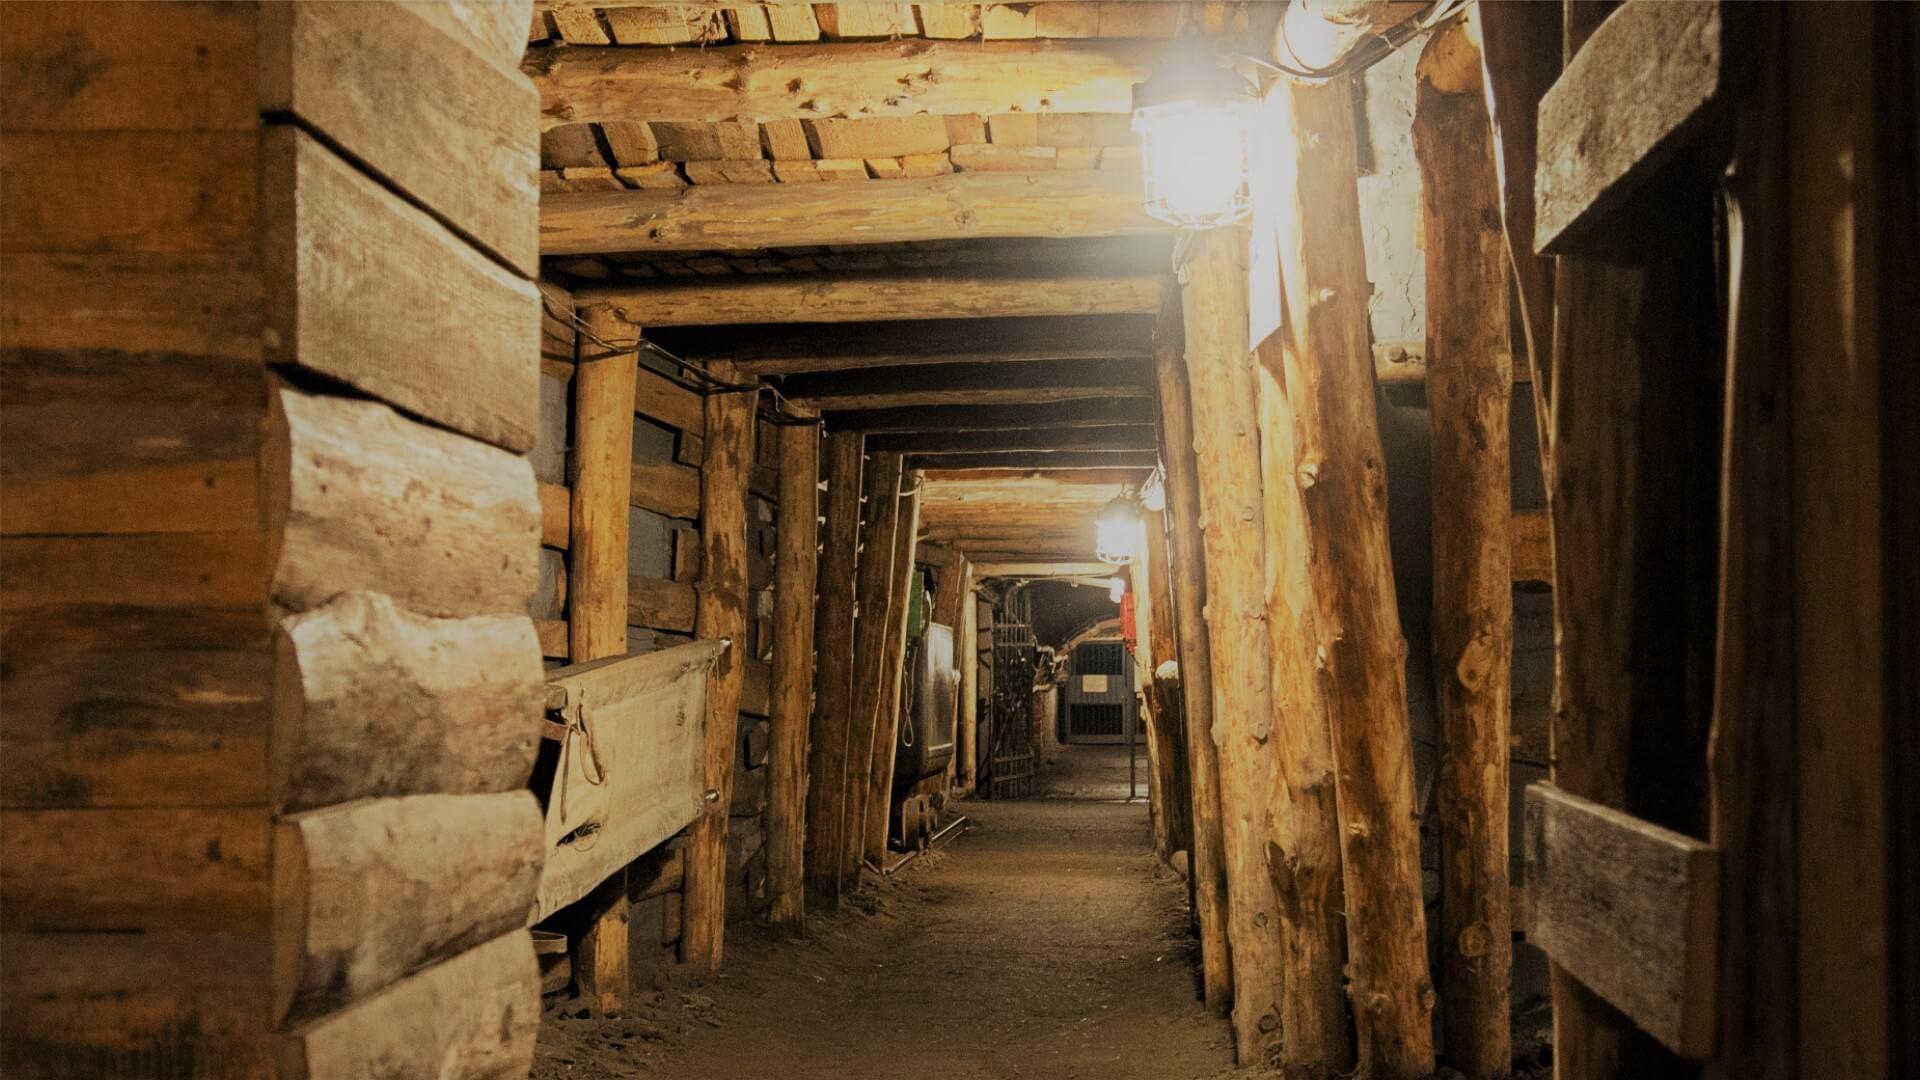 Bergwerk holzminden escape maniac for Small room escape 12